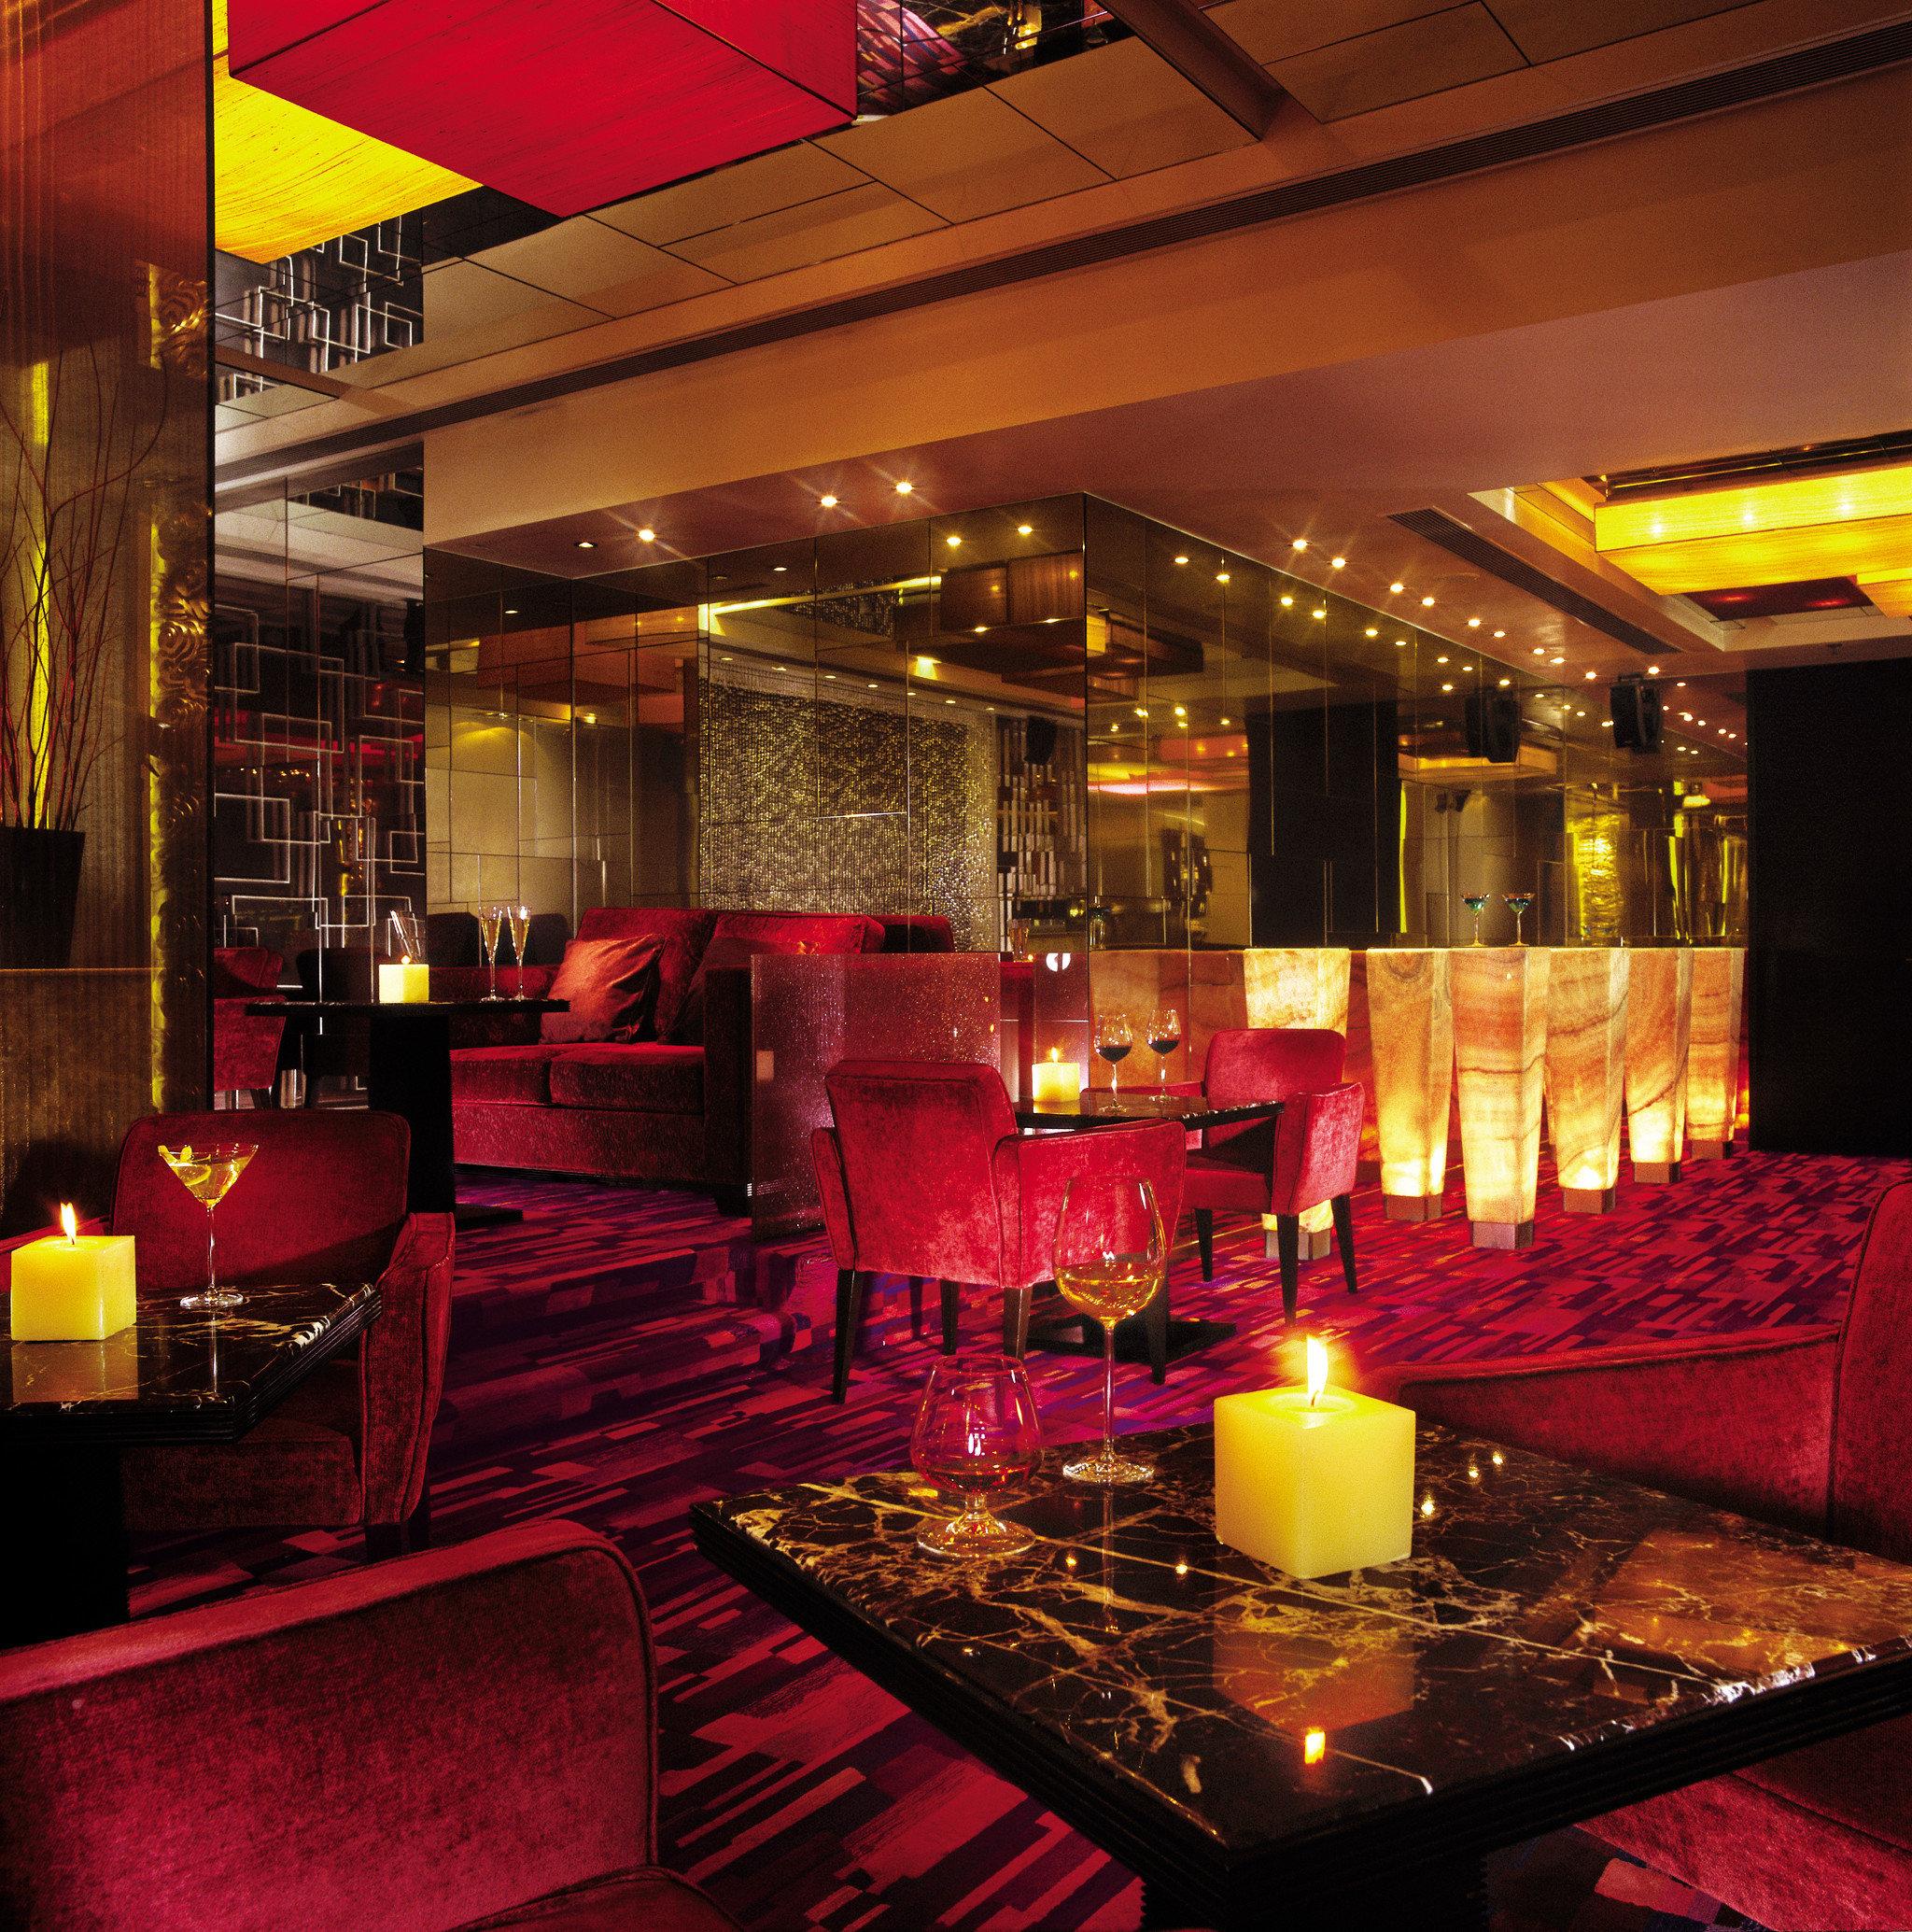 Dining Drink Eat Elegant Luxury Modern Bar restaurant nightclub function hall Lobby